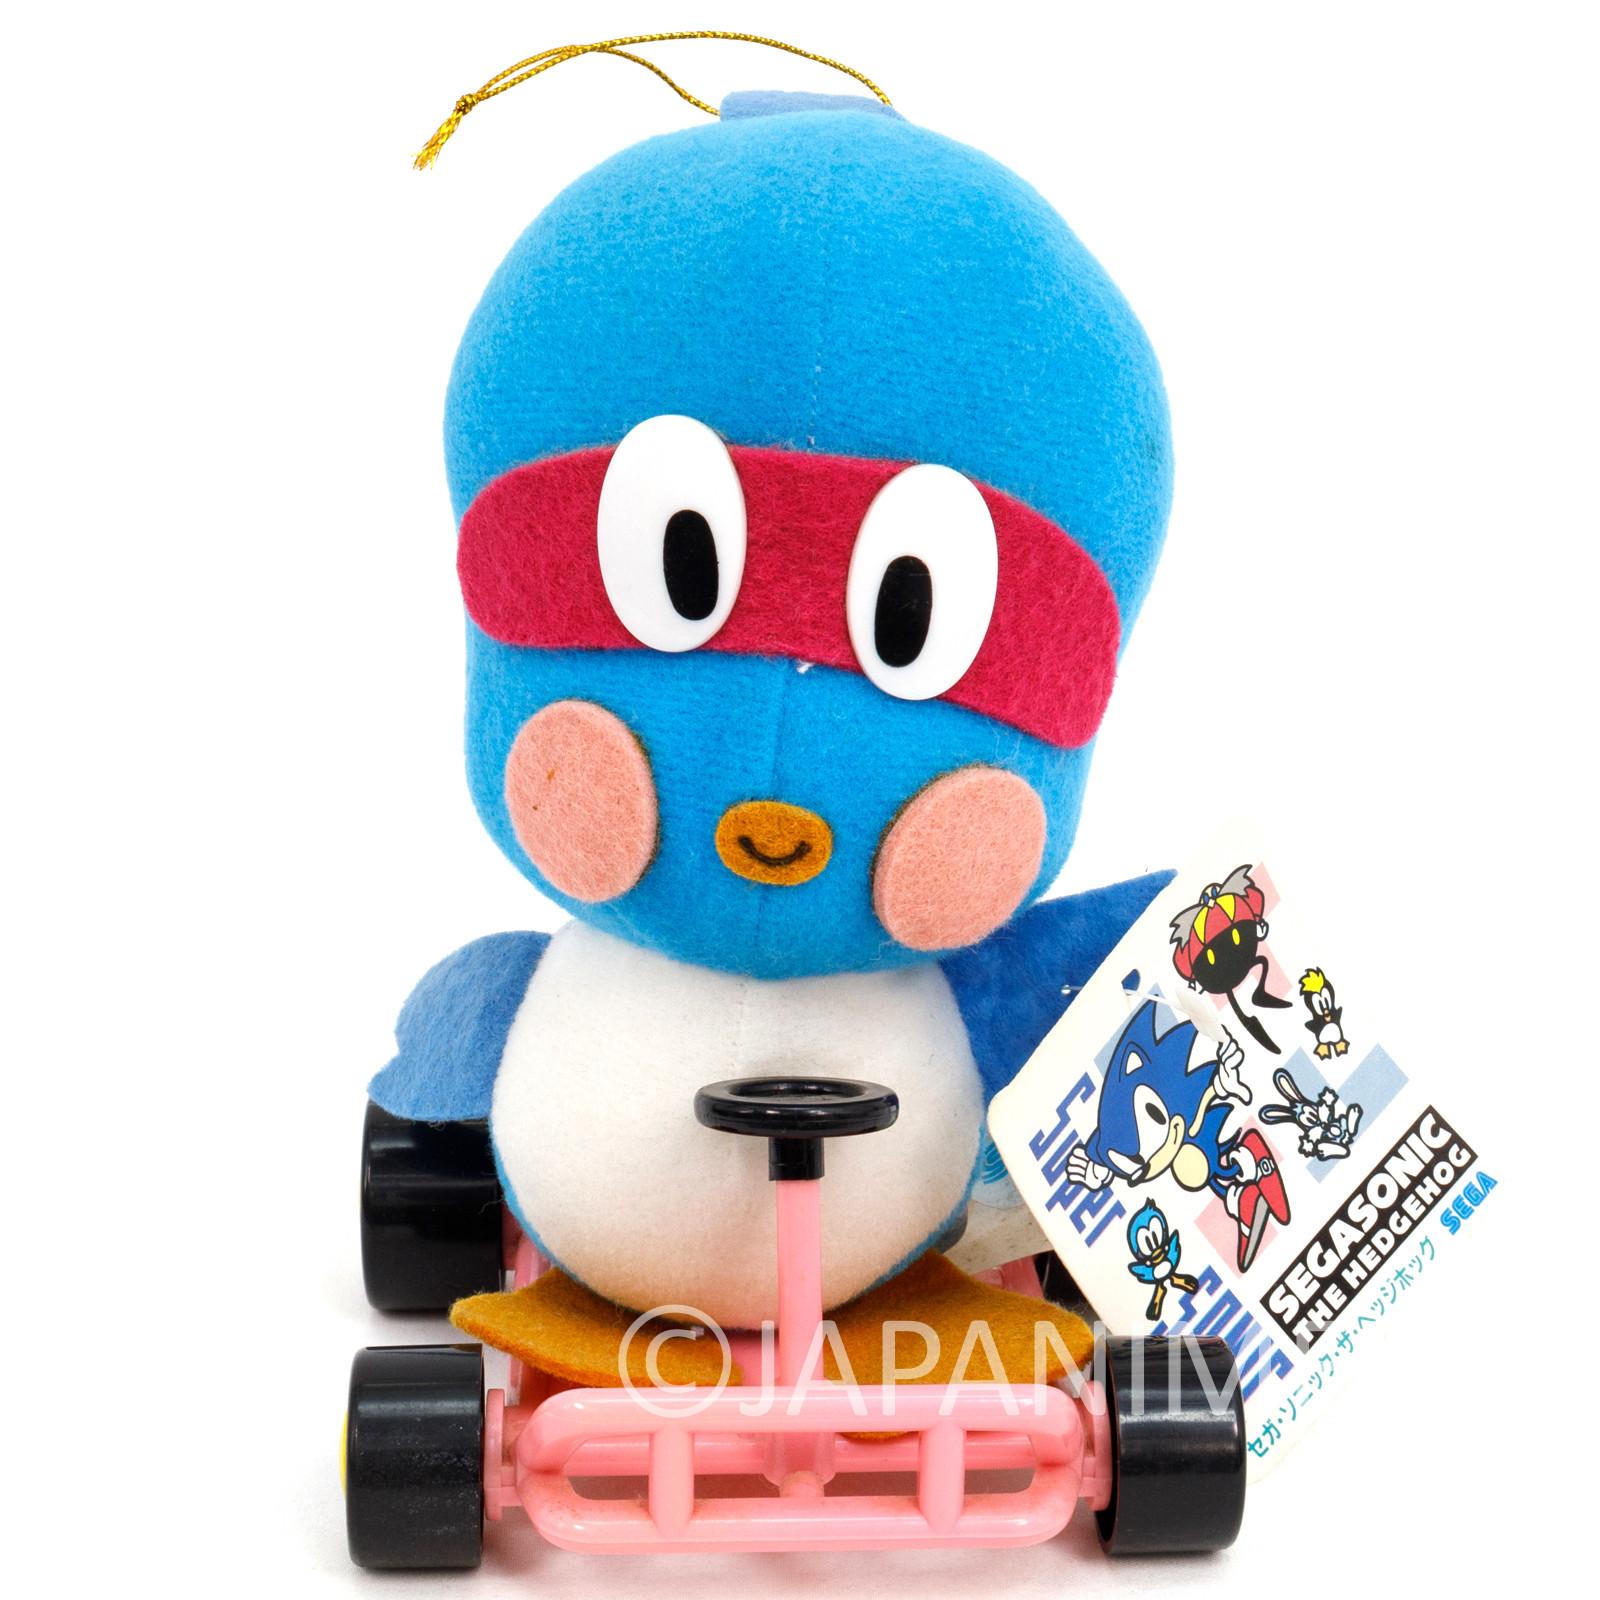 Retro RARE! Sonic The Hedgehog Flicky on Cart Plush Doll SEGA JAPAN